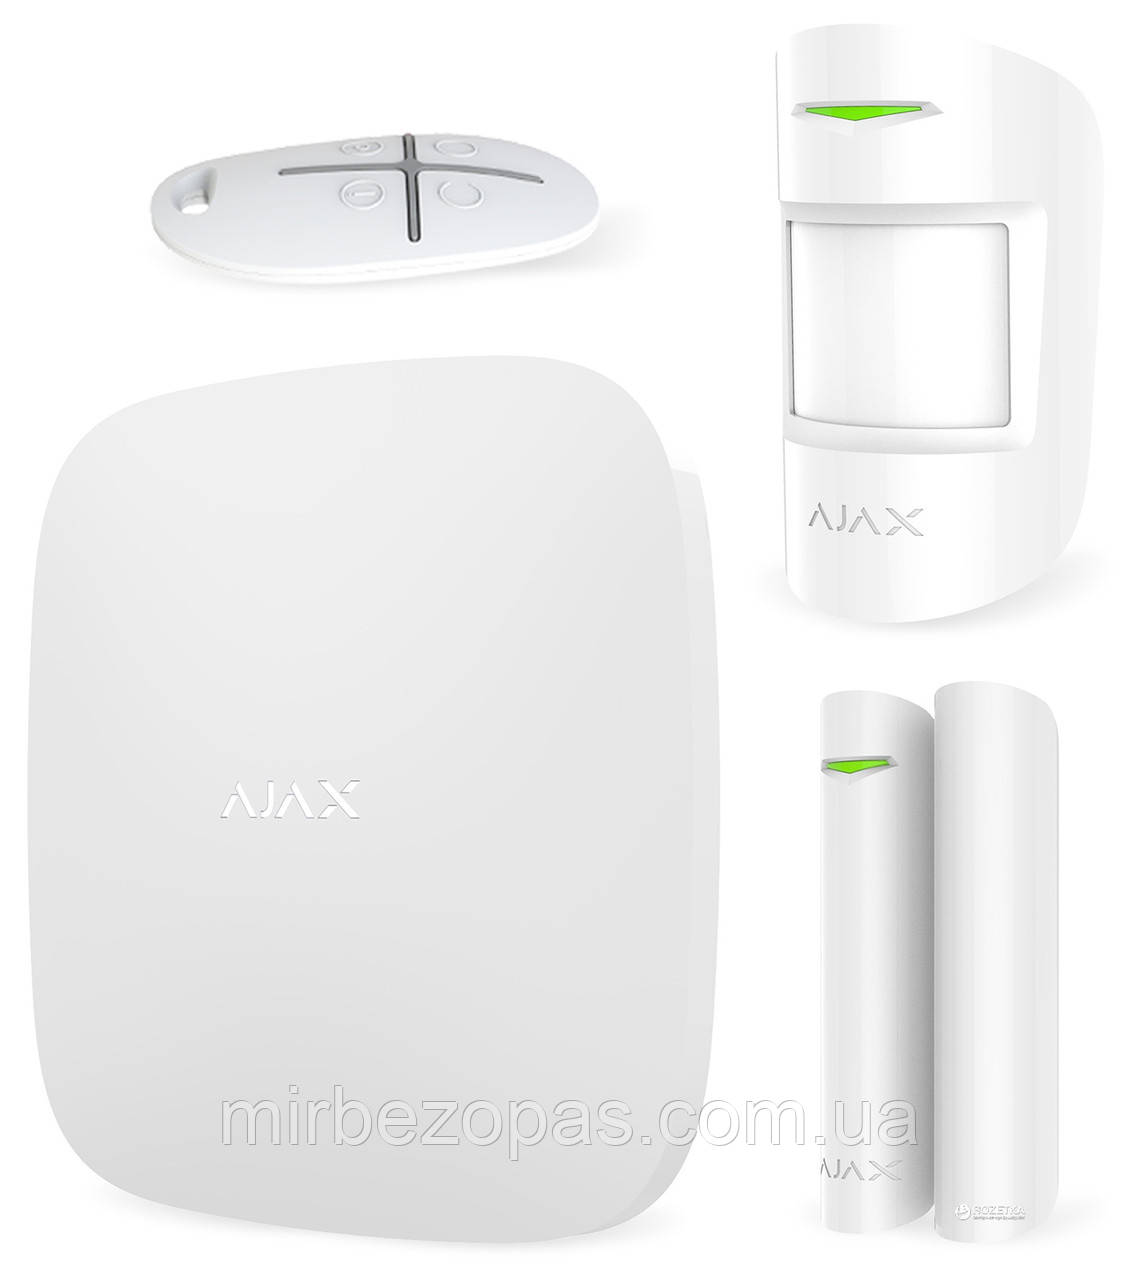 STARTERKIT White комплект беспроводной GSM-сигнализации белый (HUB kit)